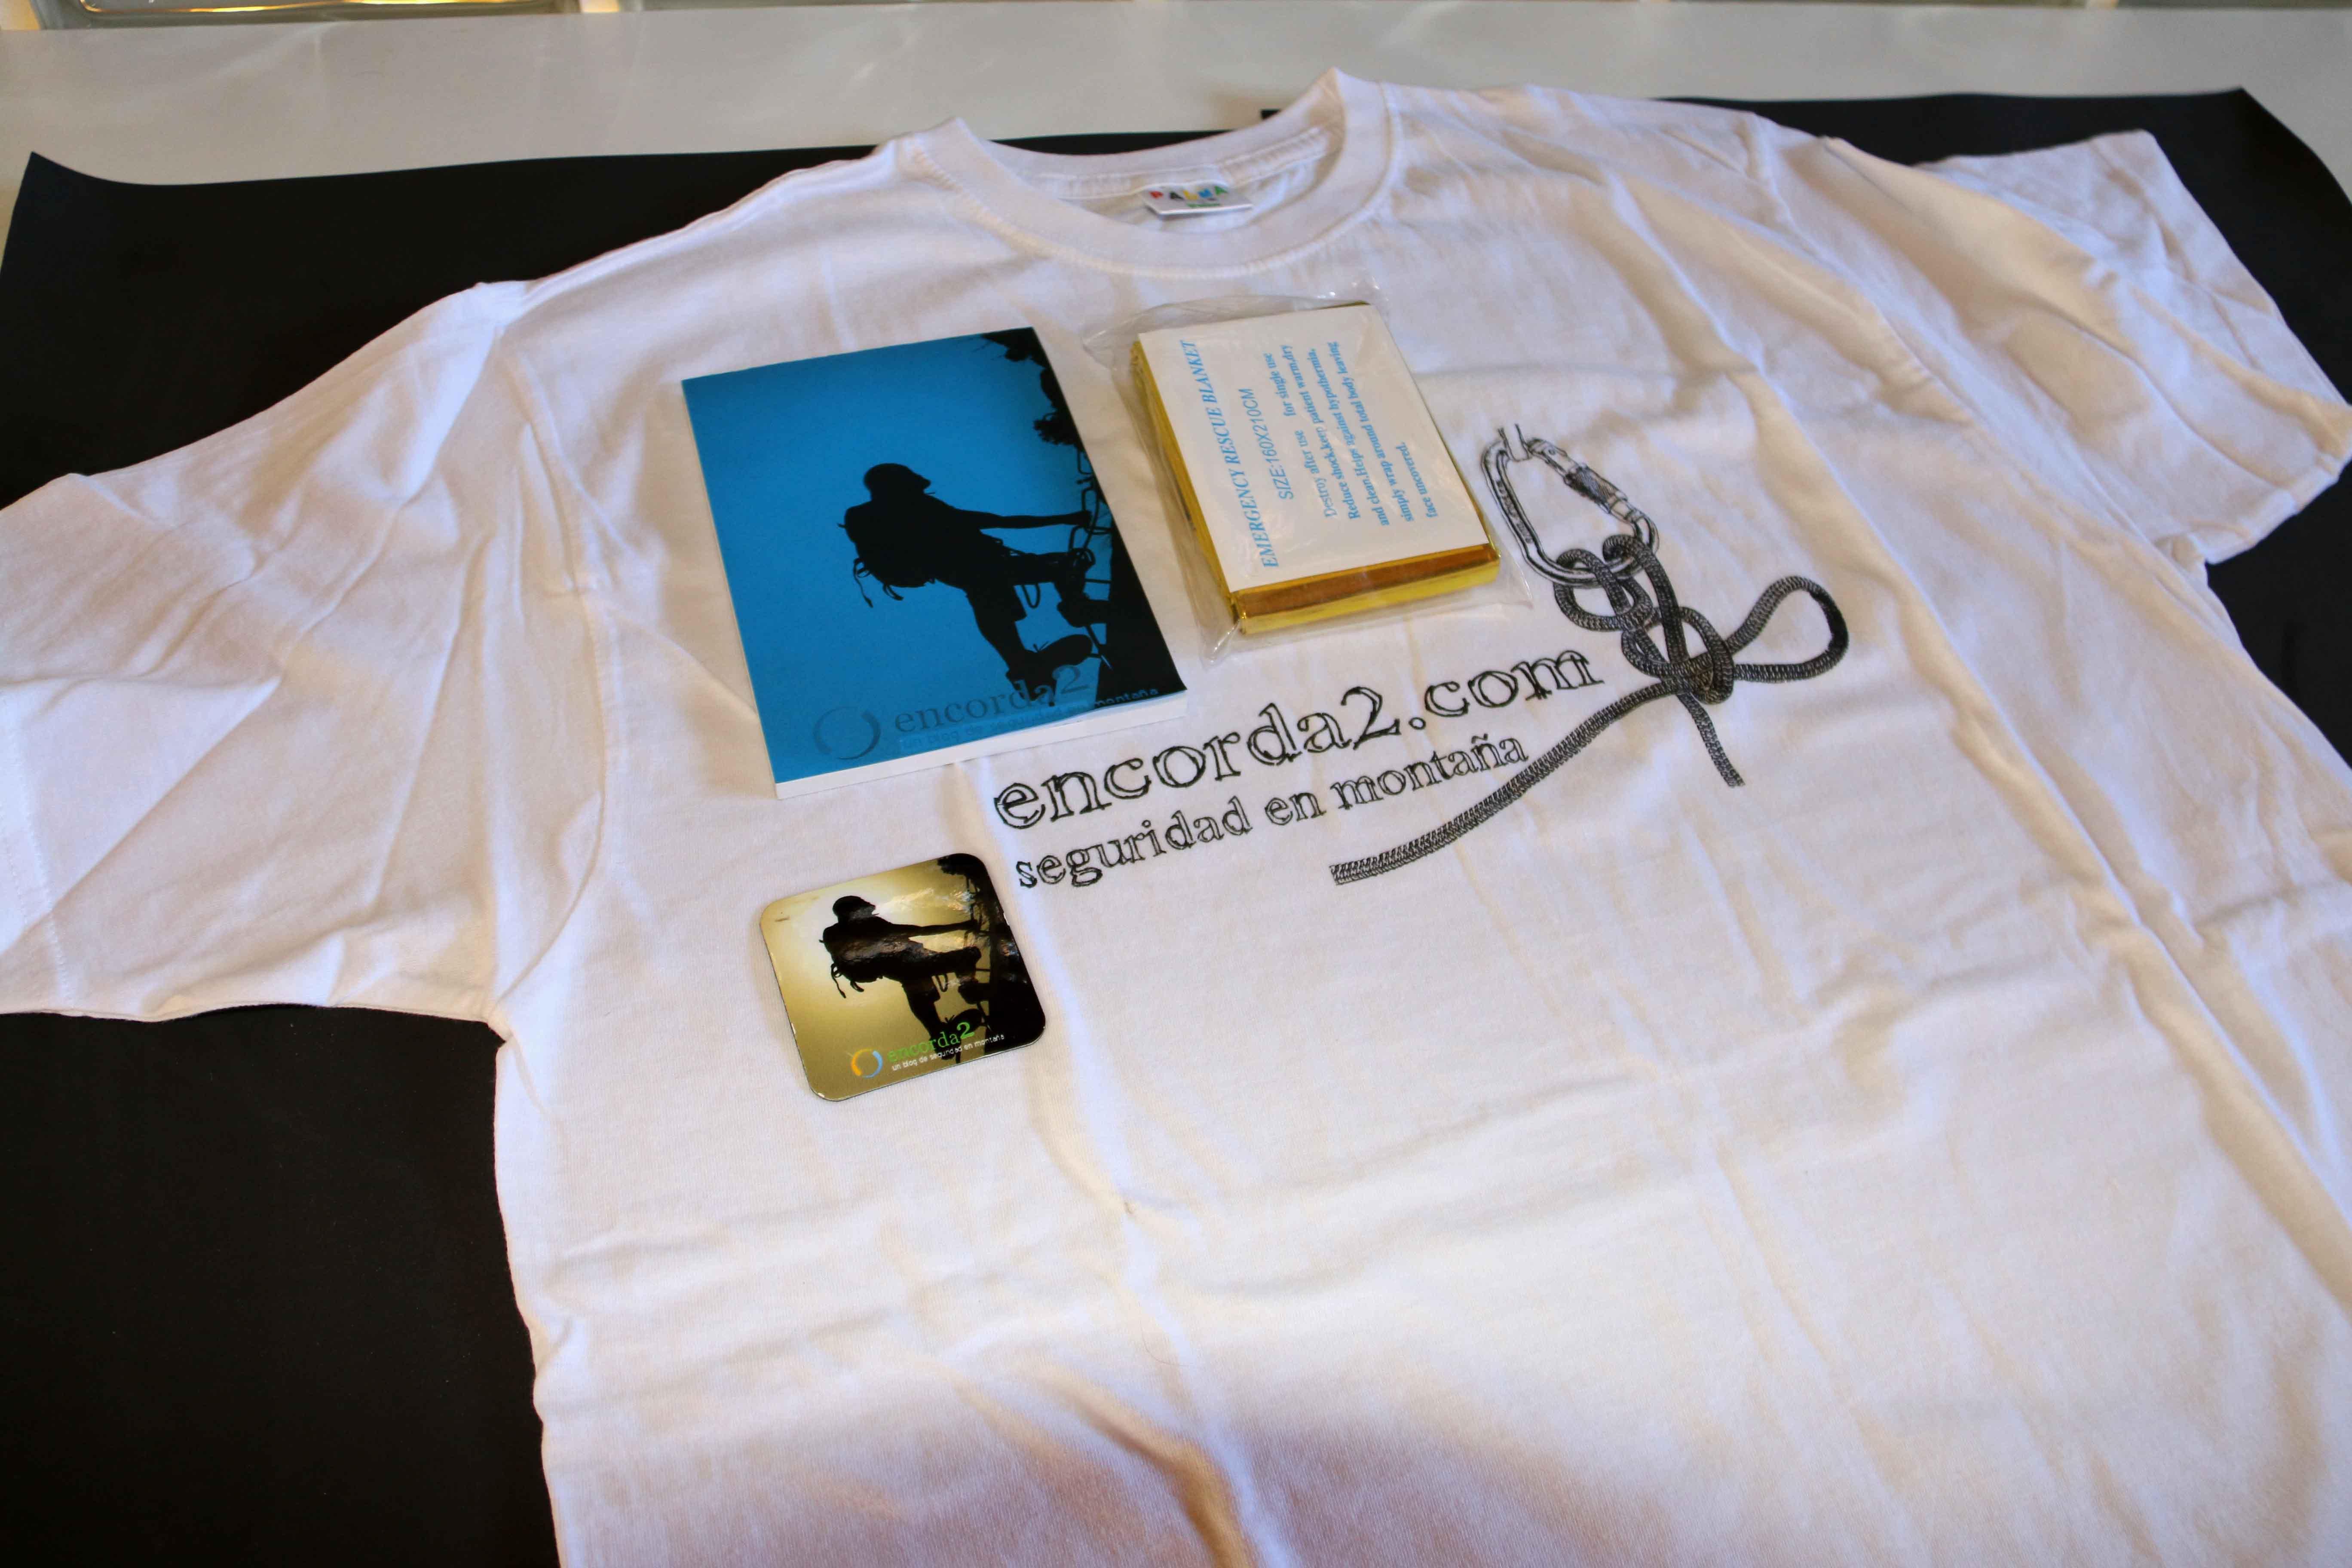 Camiseta encorda2